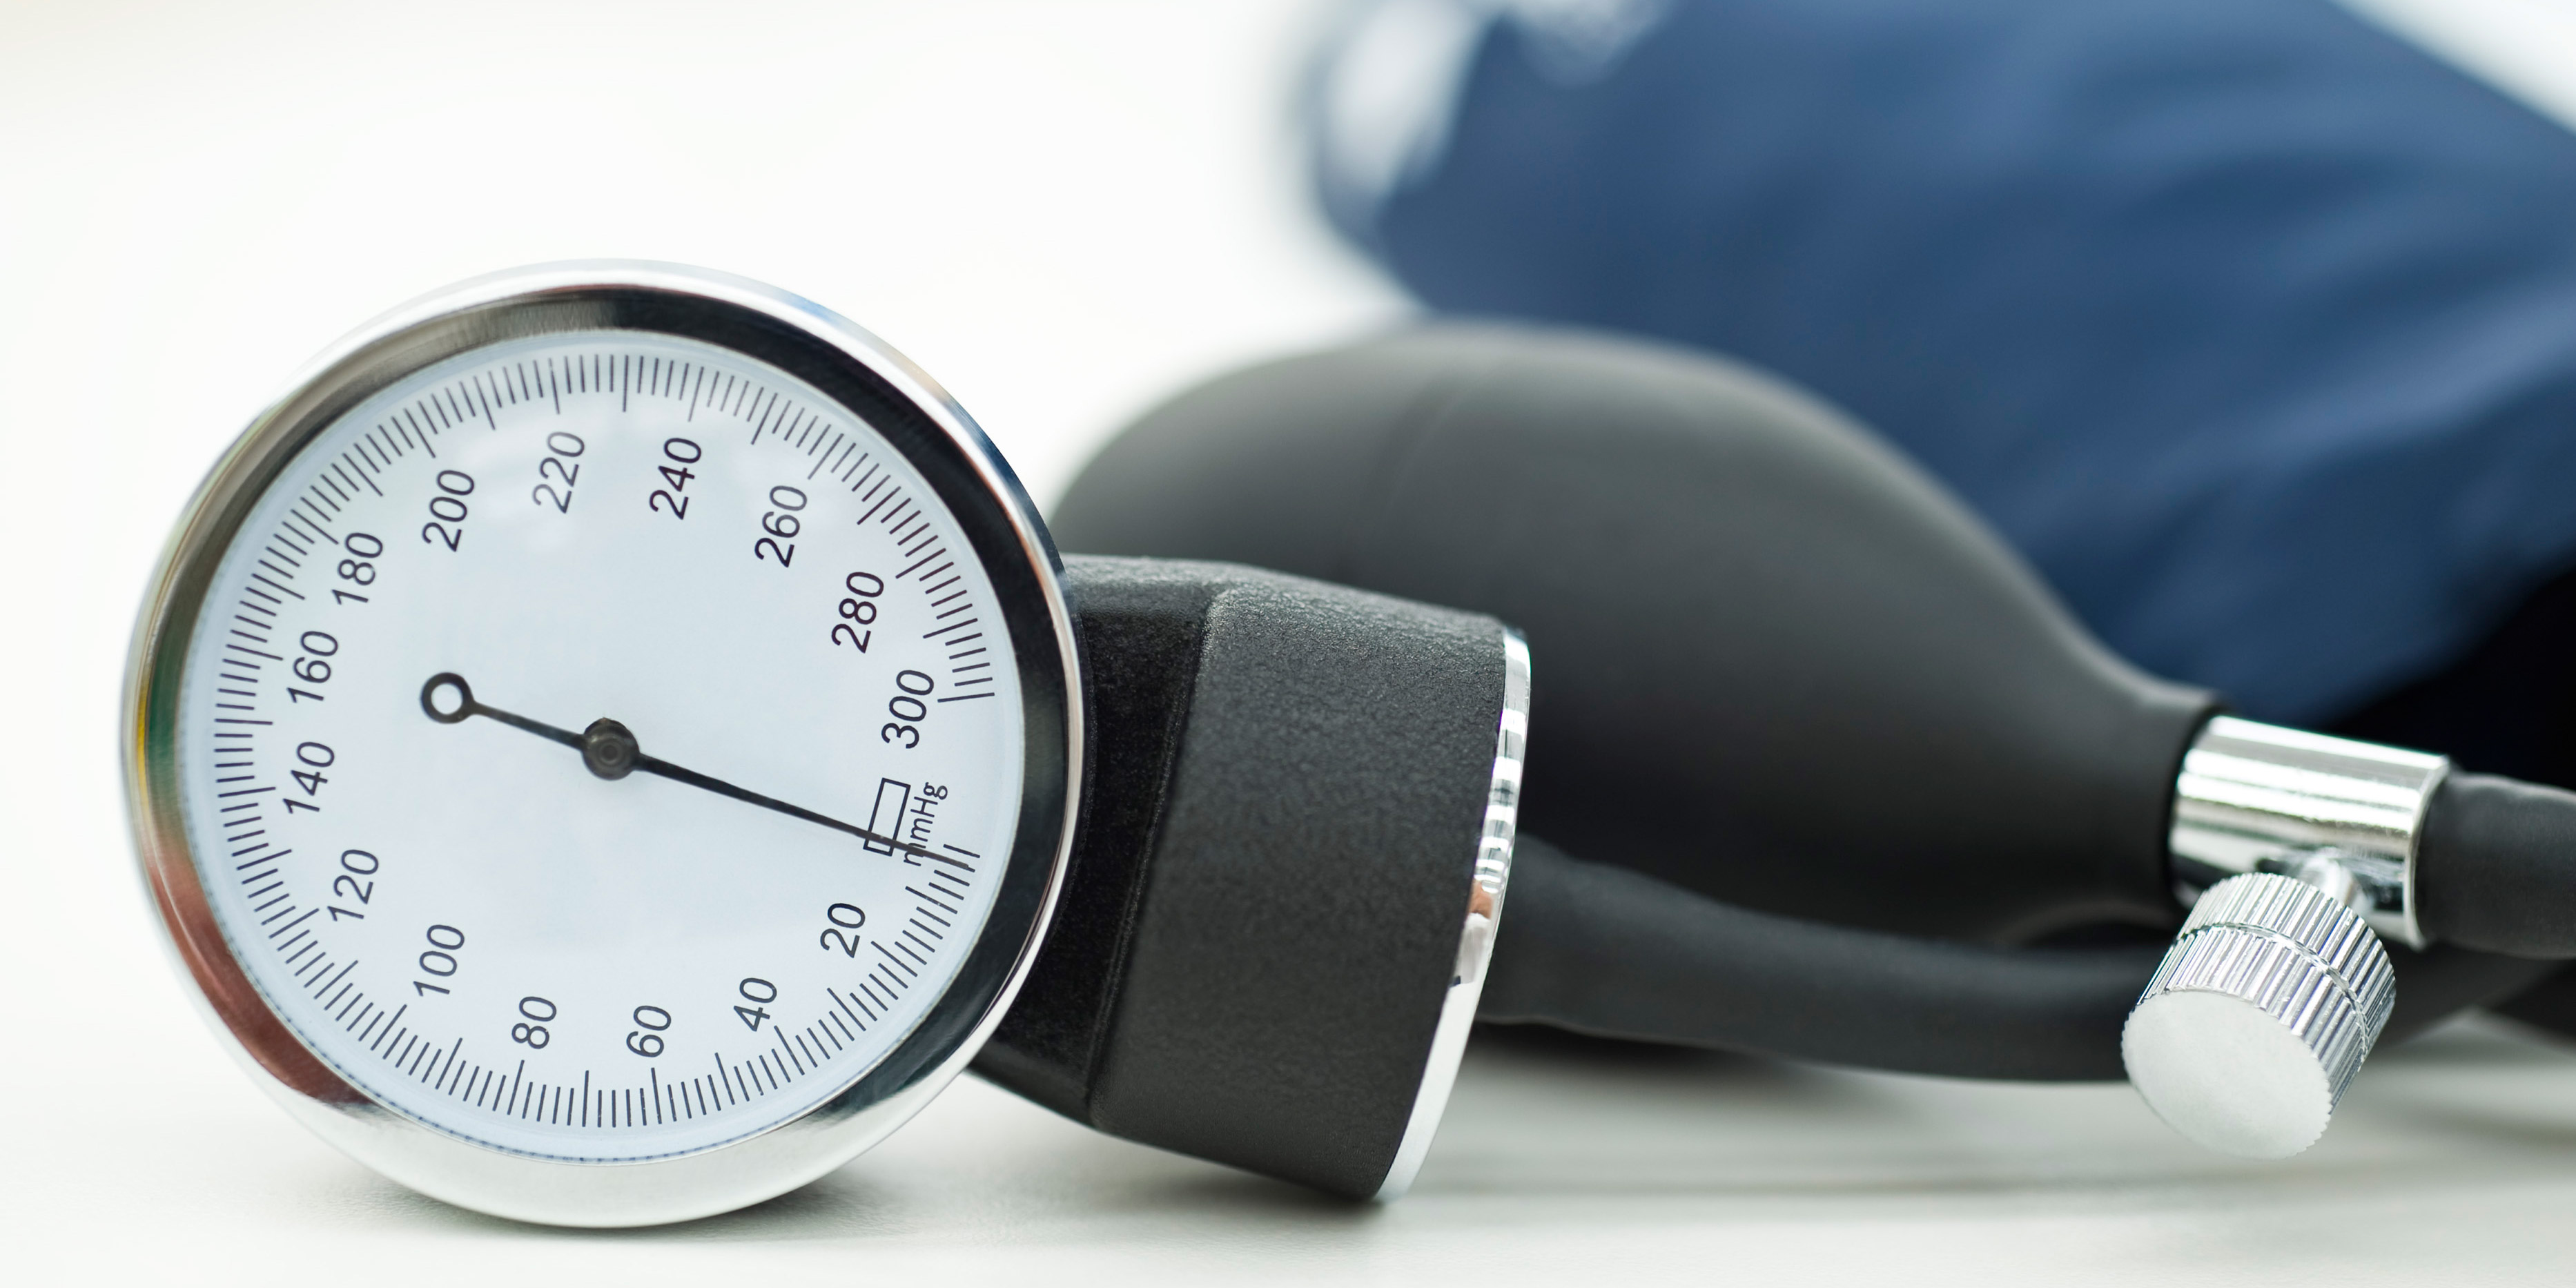 magas vérnyomás 53 évesen hormonok magas vérnyomás